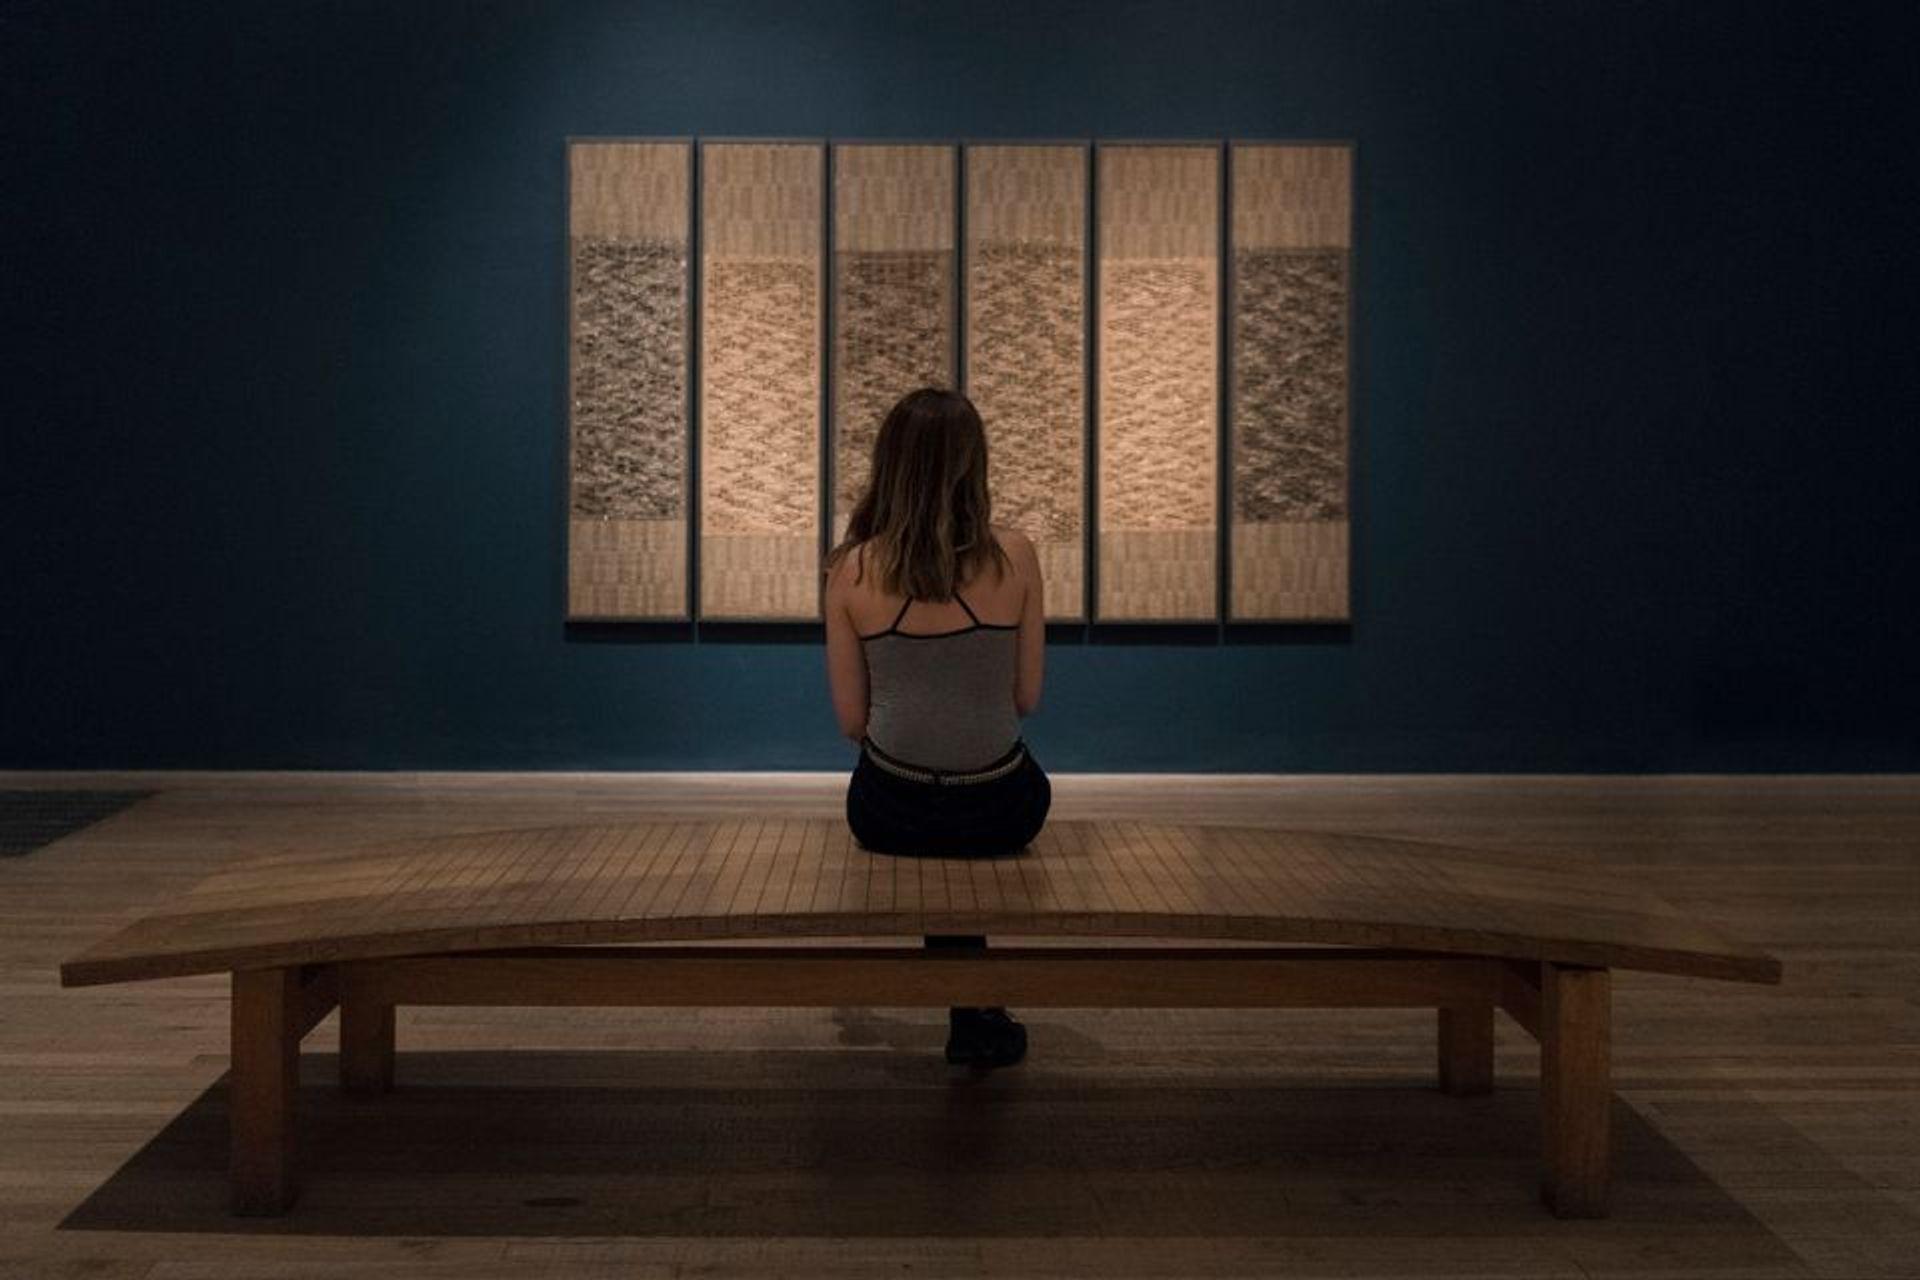 An installation view of Anni Albers's Six Prayers at Tate Modern Photo: © Tate, 2018